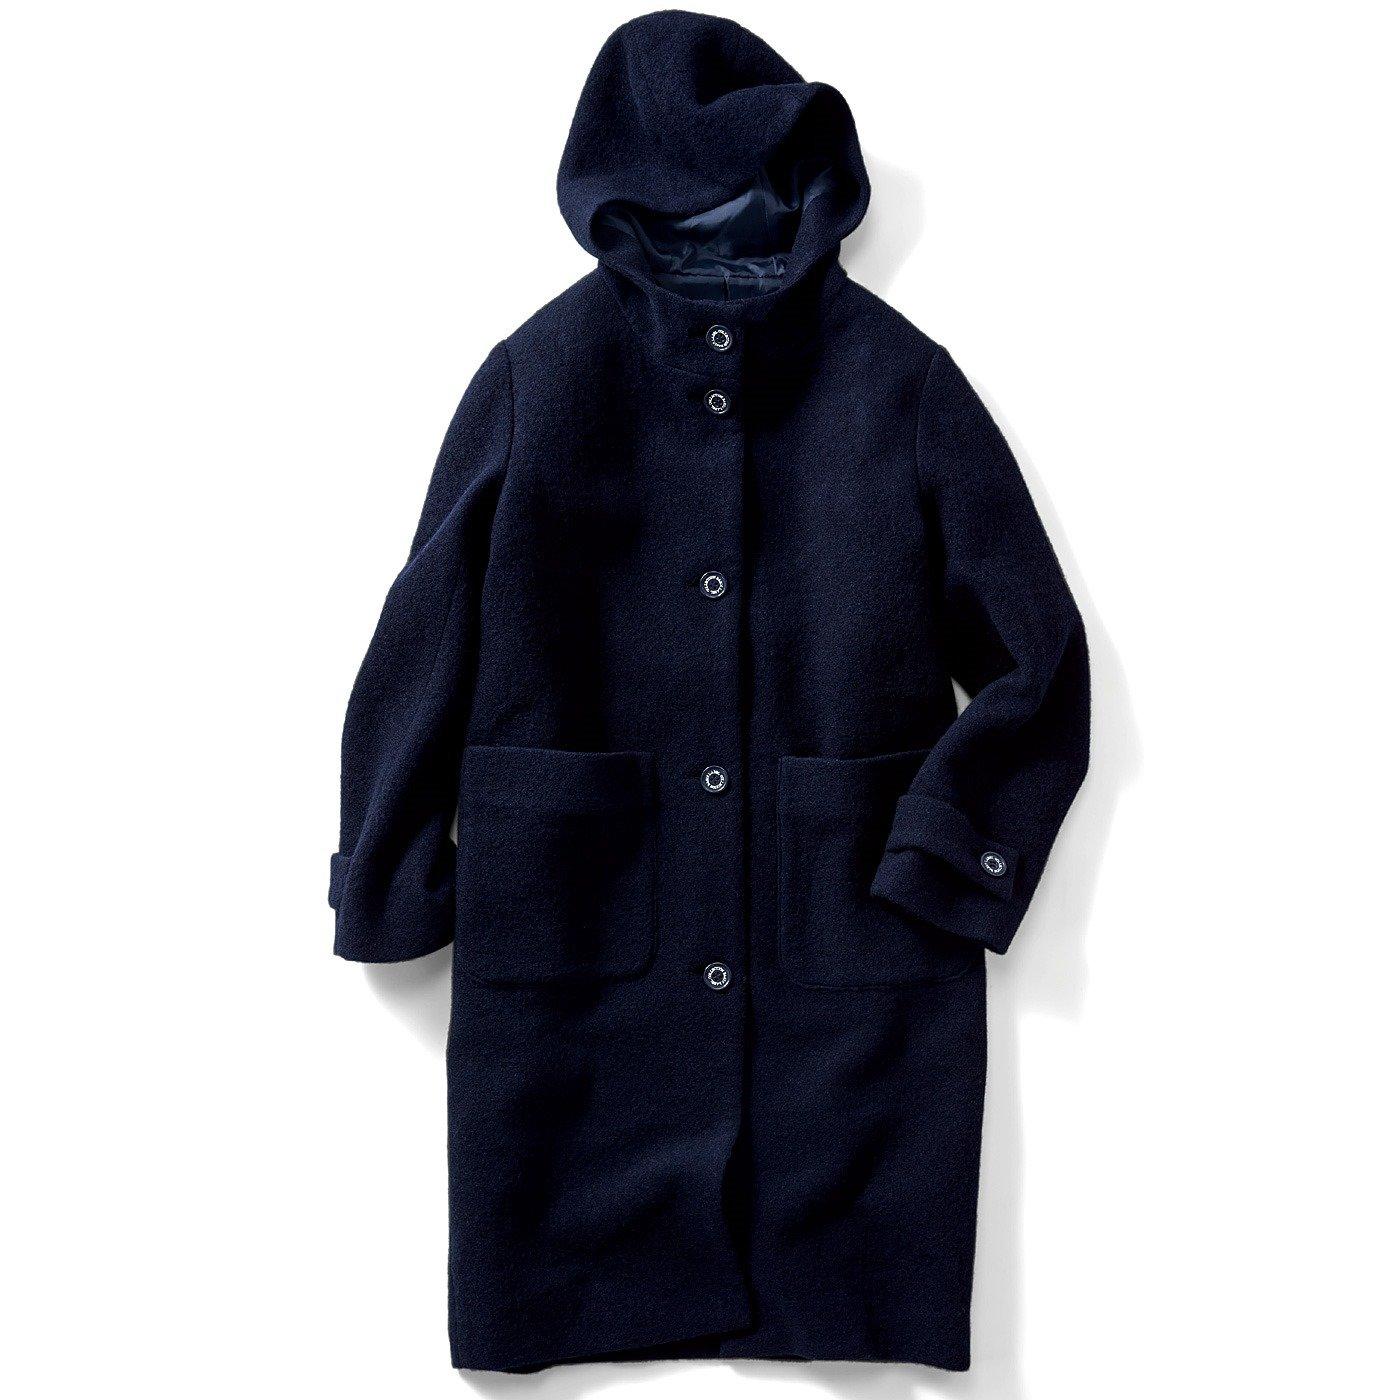 IEDIT[イディット] ウールがたっぷり入って軽くて暖か スライバーニット素材のきちんと見えすっきりコート〈ネイビー〉